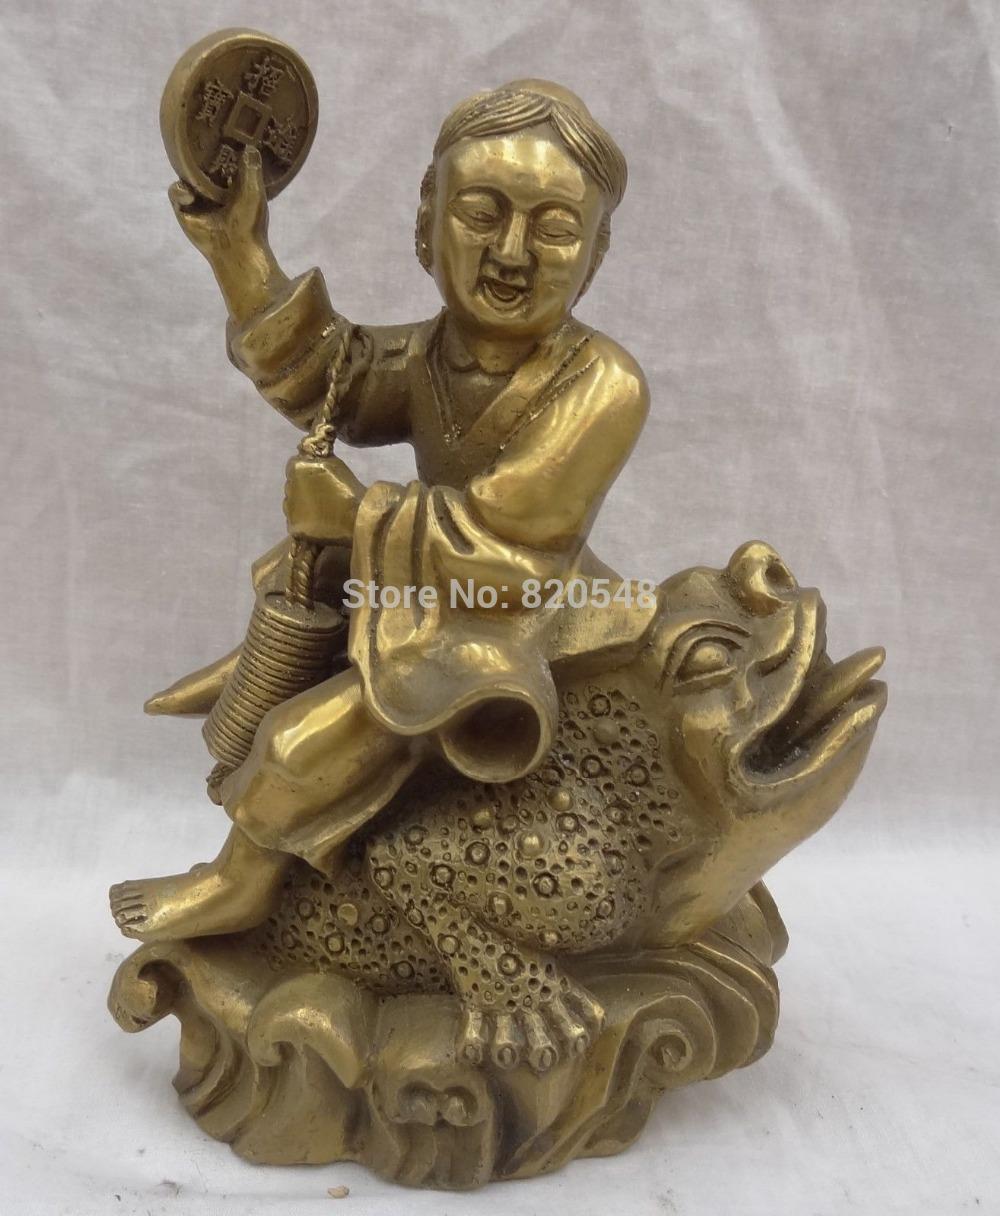 China Brass Wealth Coin Sculpture Kid Child LiHai Ride Gilt Hoptoad Toad Statue(China (Mainland))